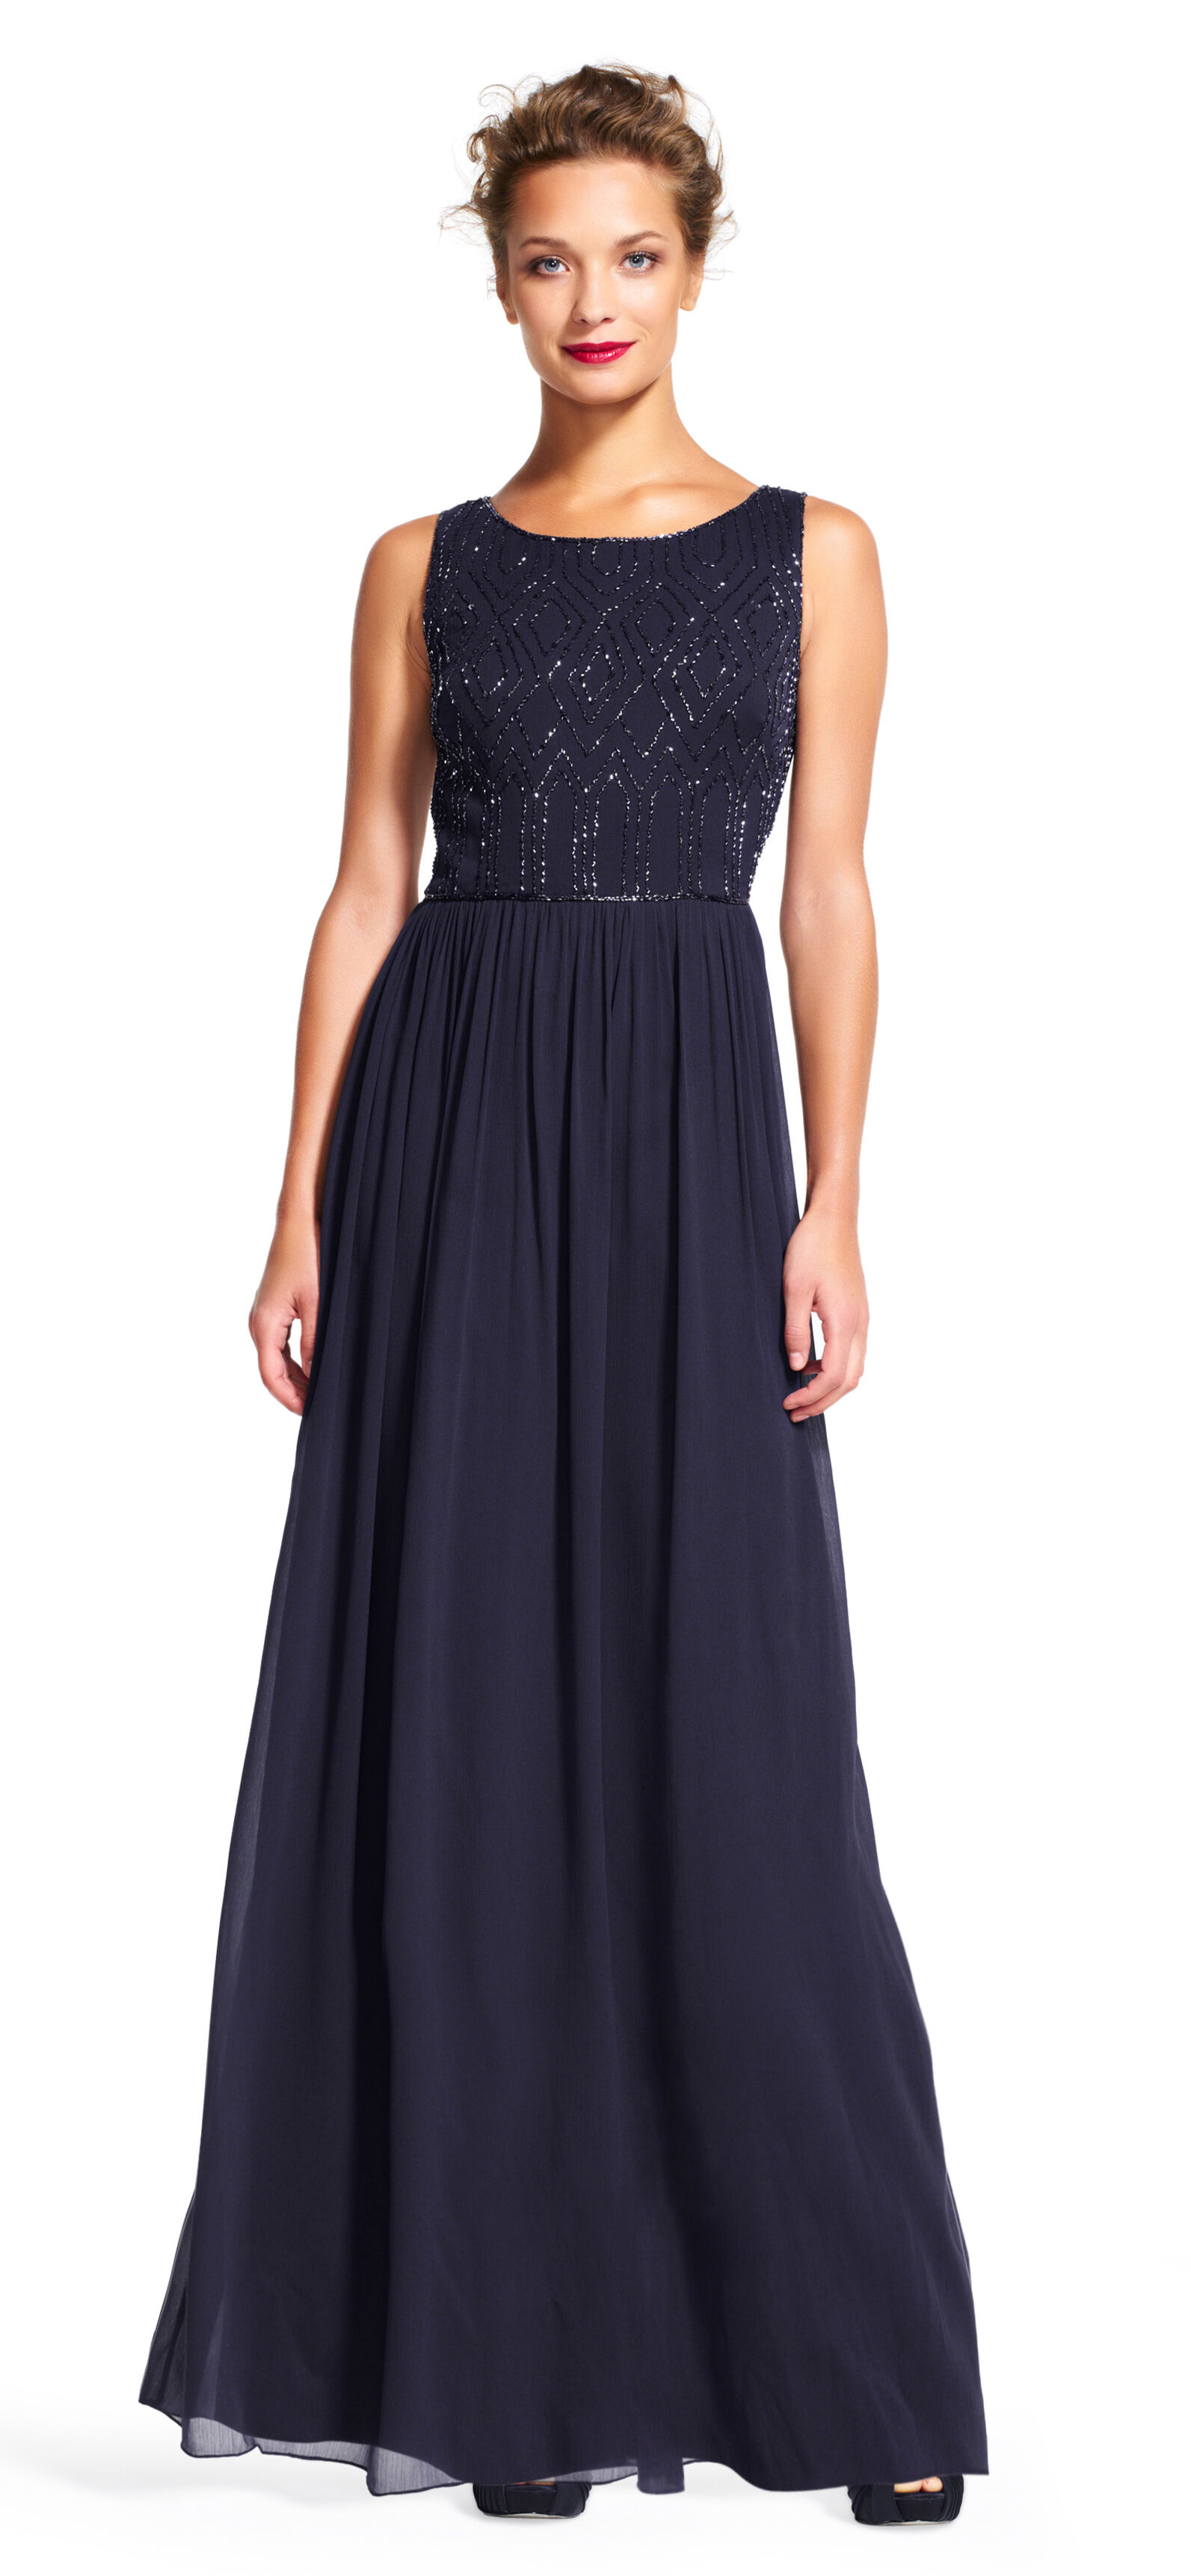 Where to Find Chiffon Dress